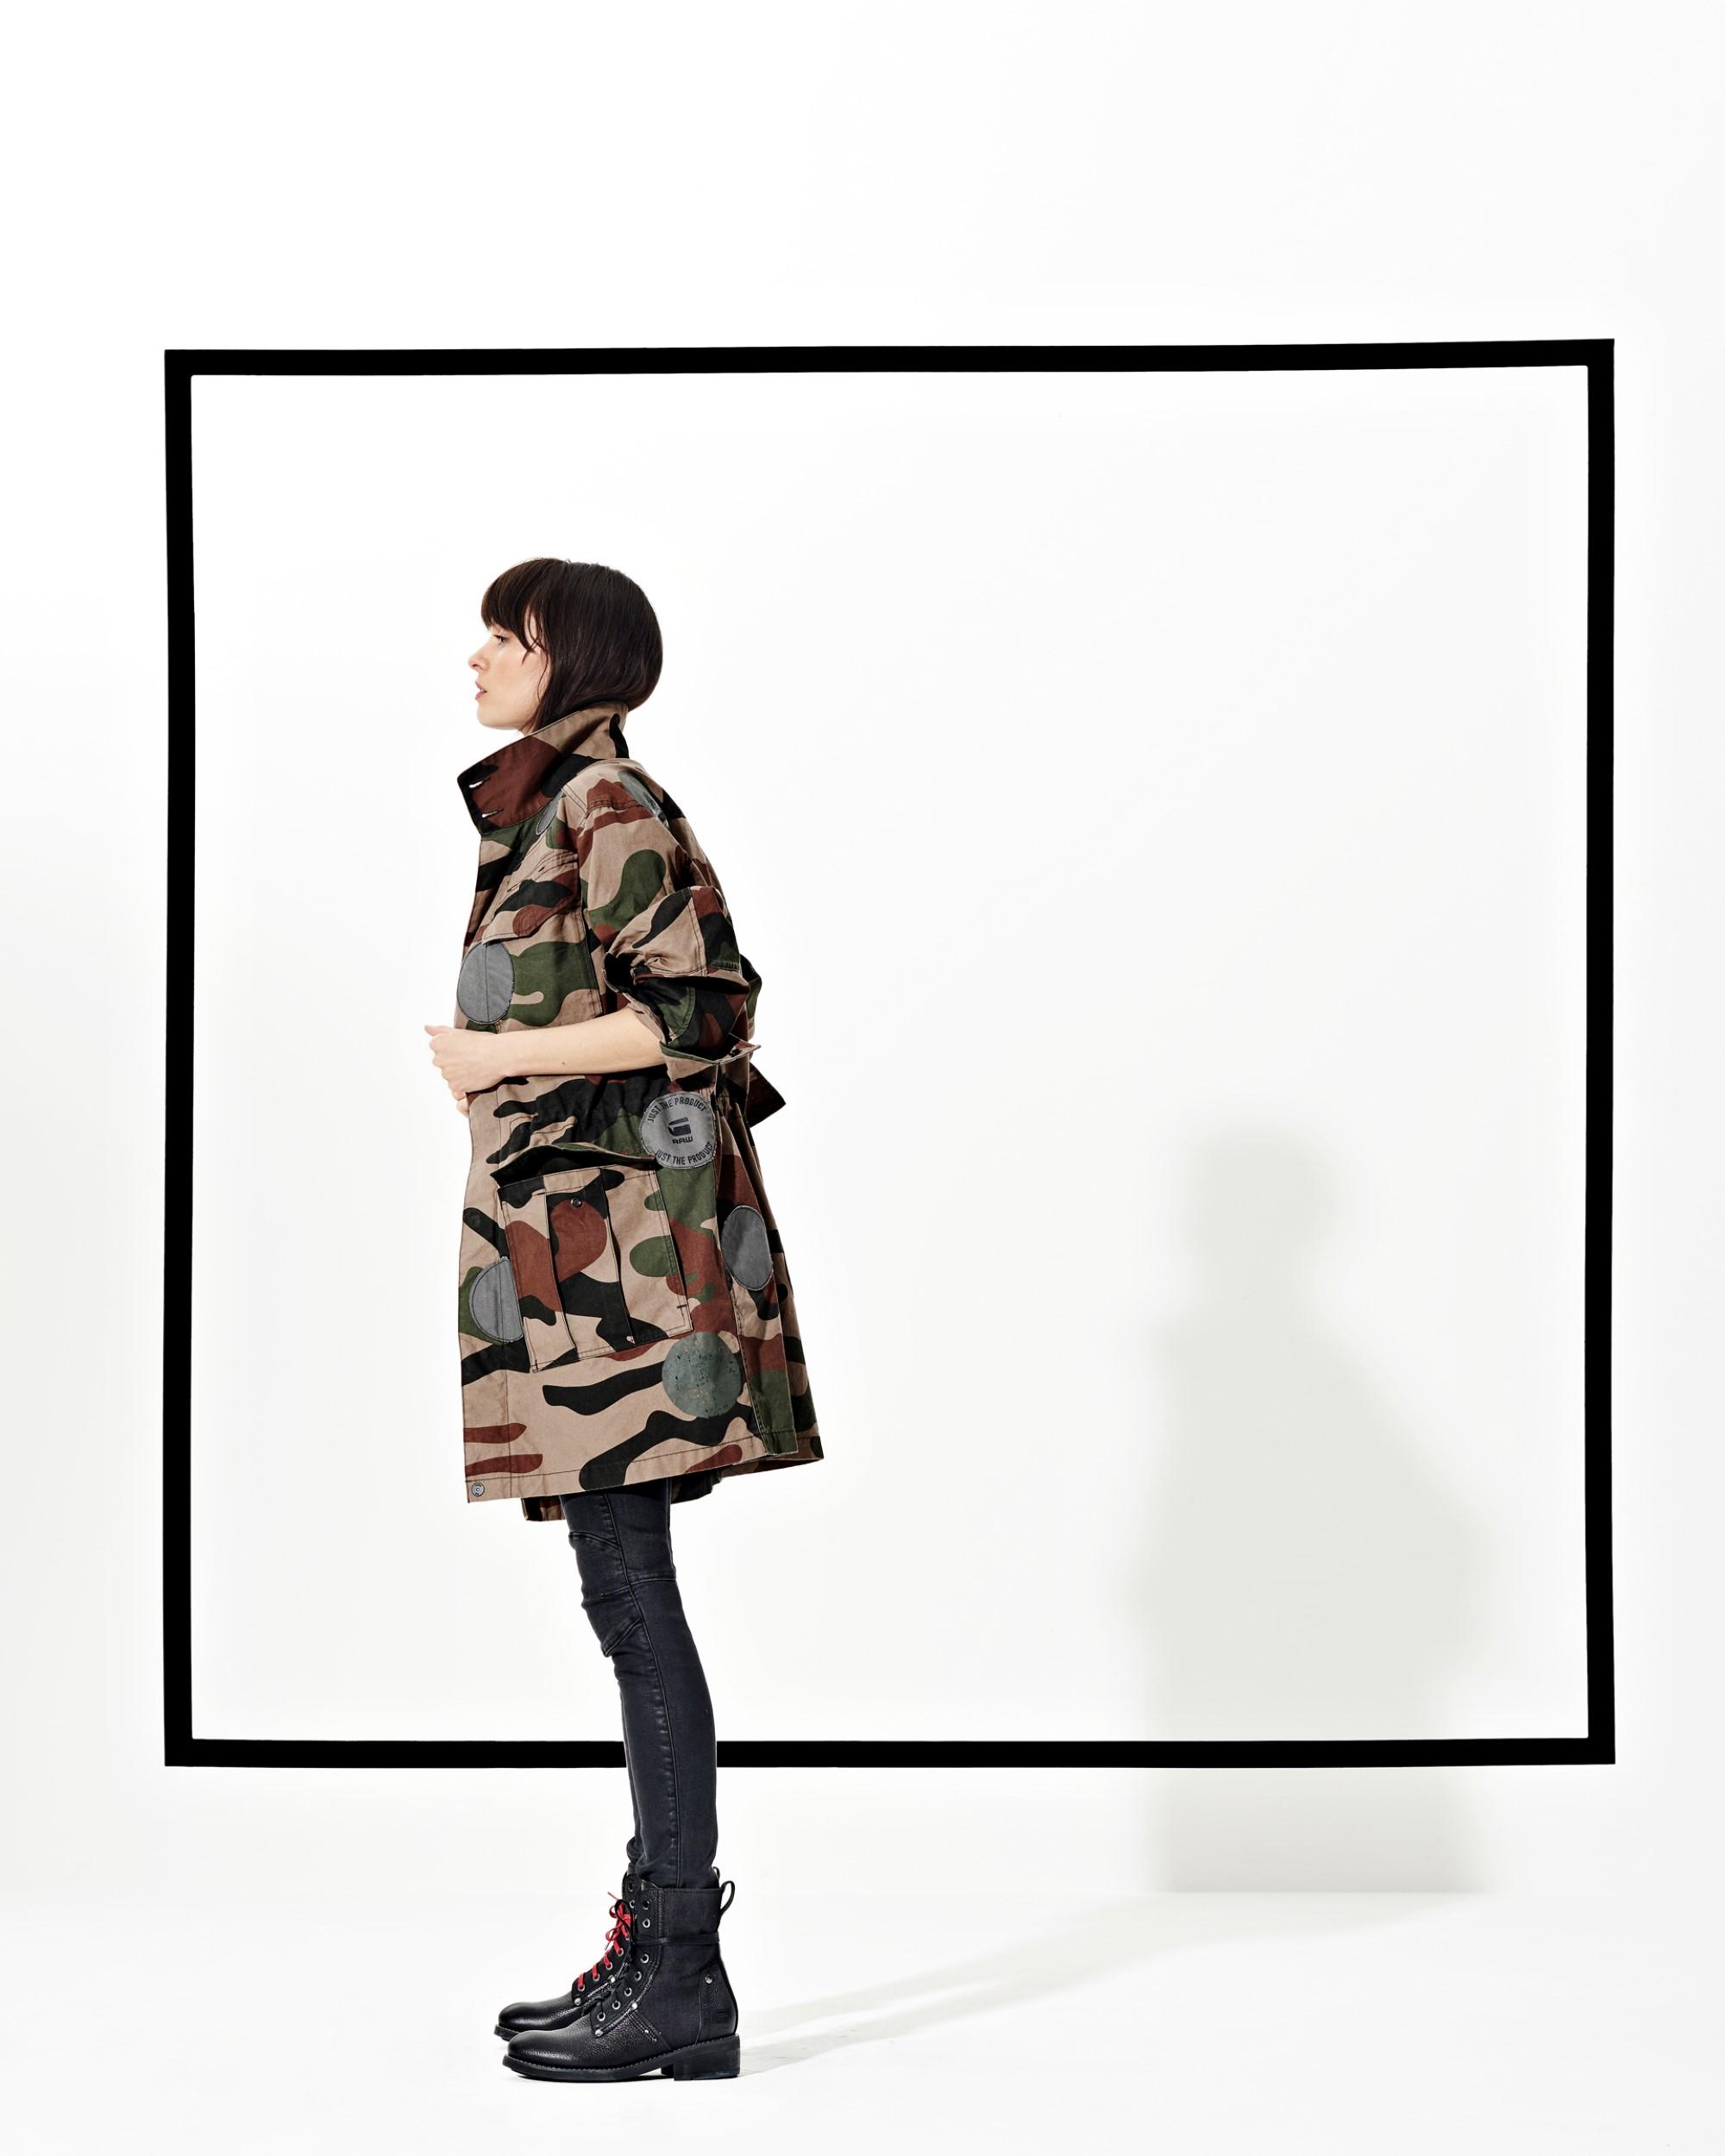 "G STAR סתיו חורף 2017 מעיל 999 ש""ח (צילום יחצ חול)"